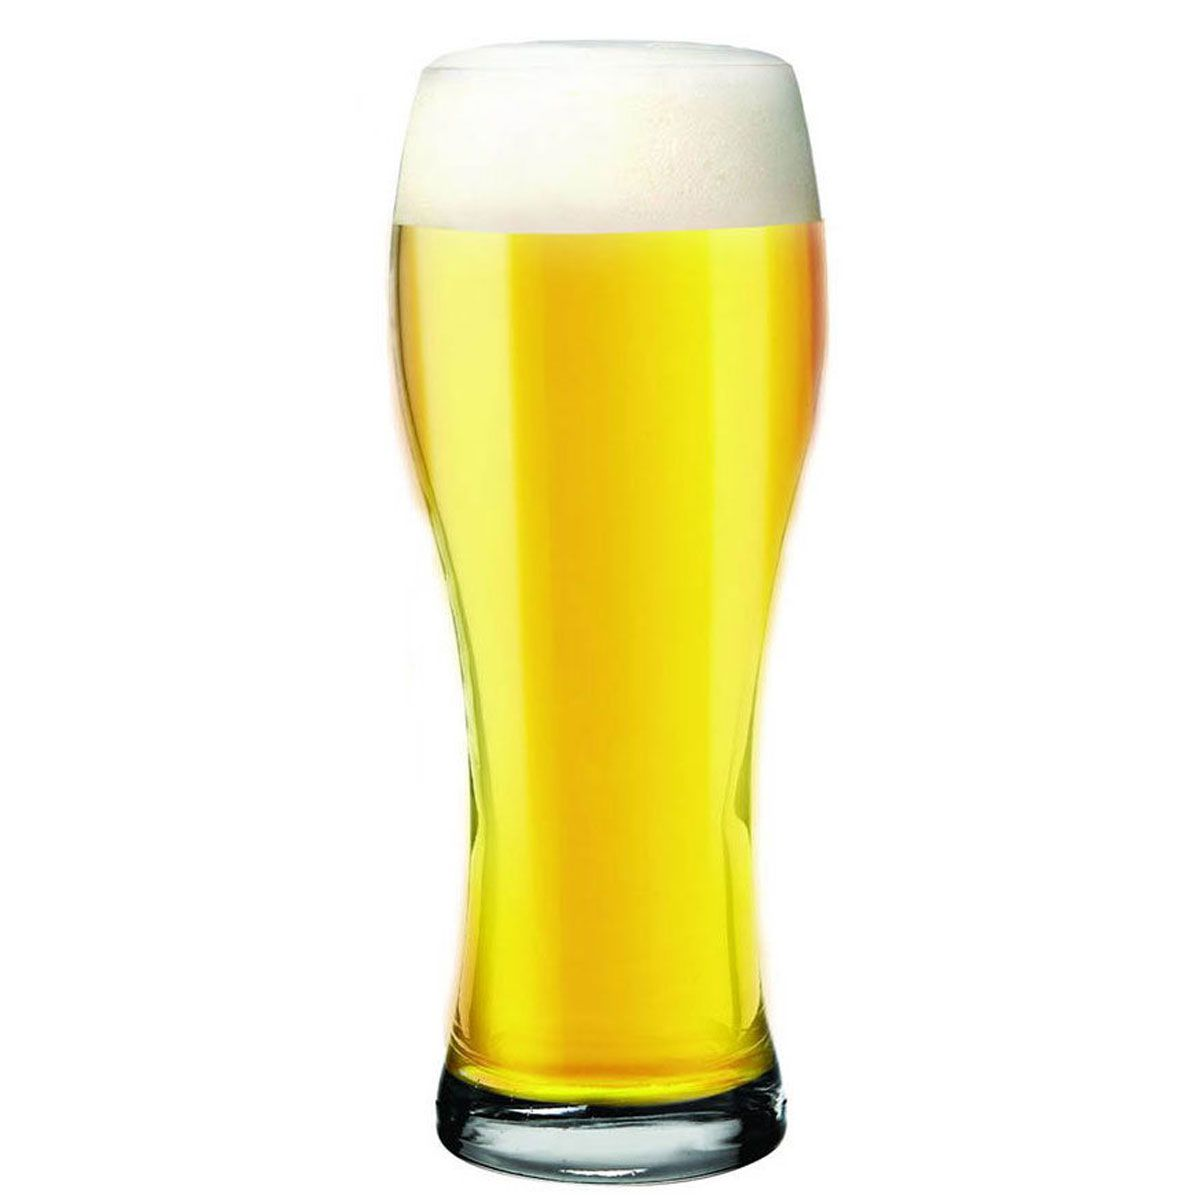 Entenda a importância de utilizar o copo certo.